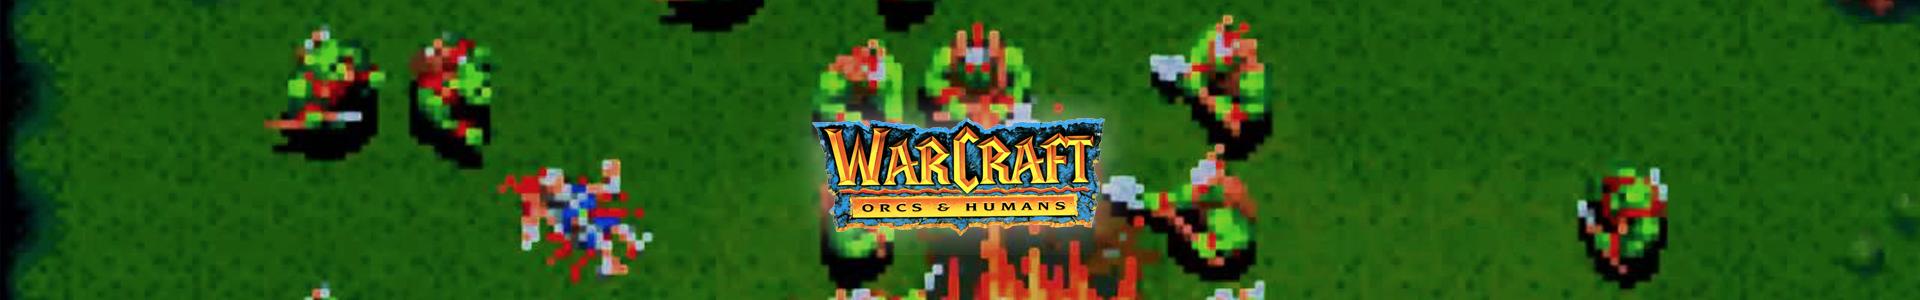 warcraft statistics